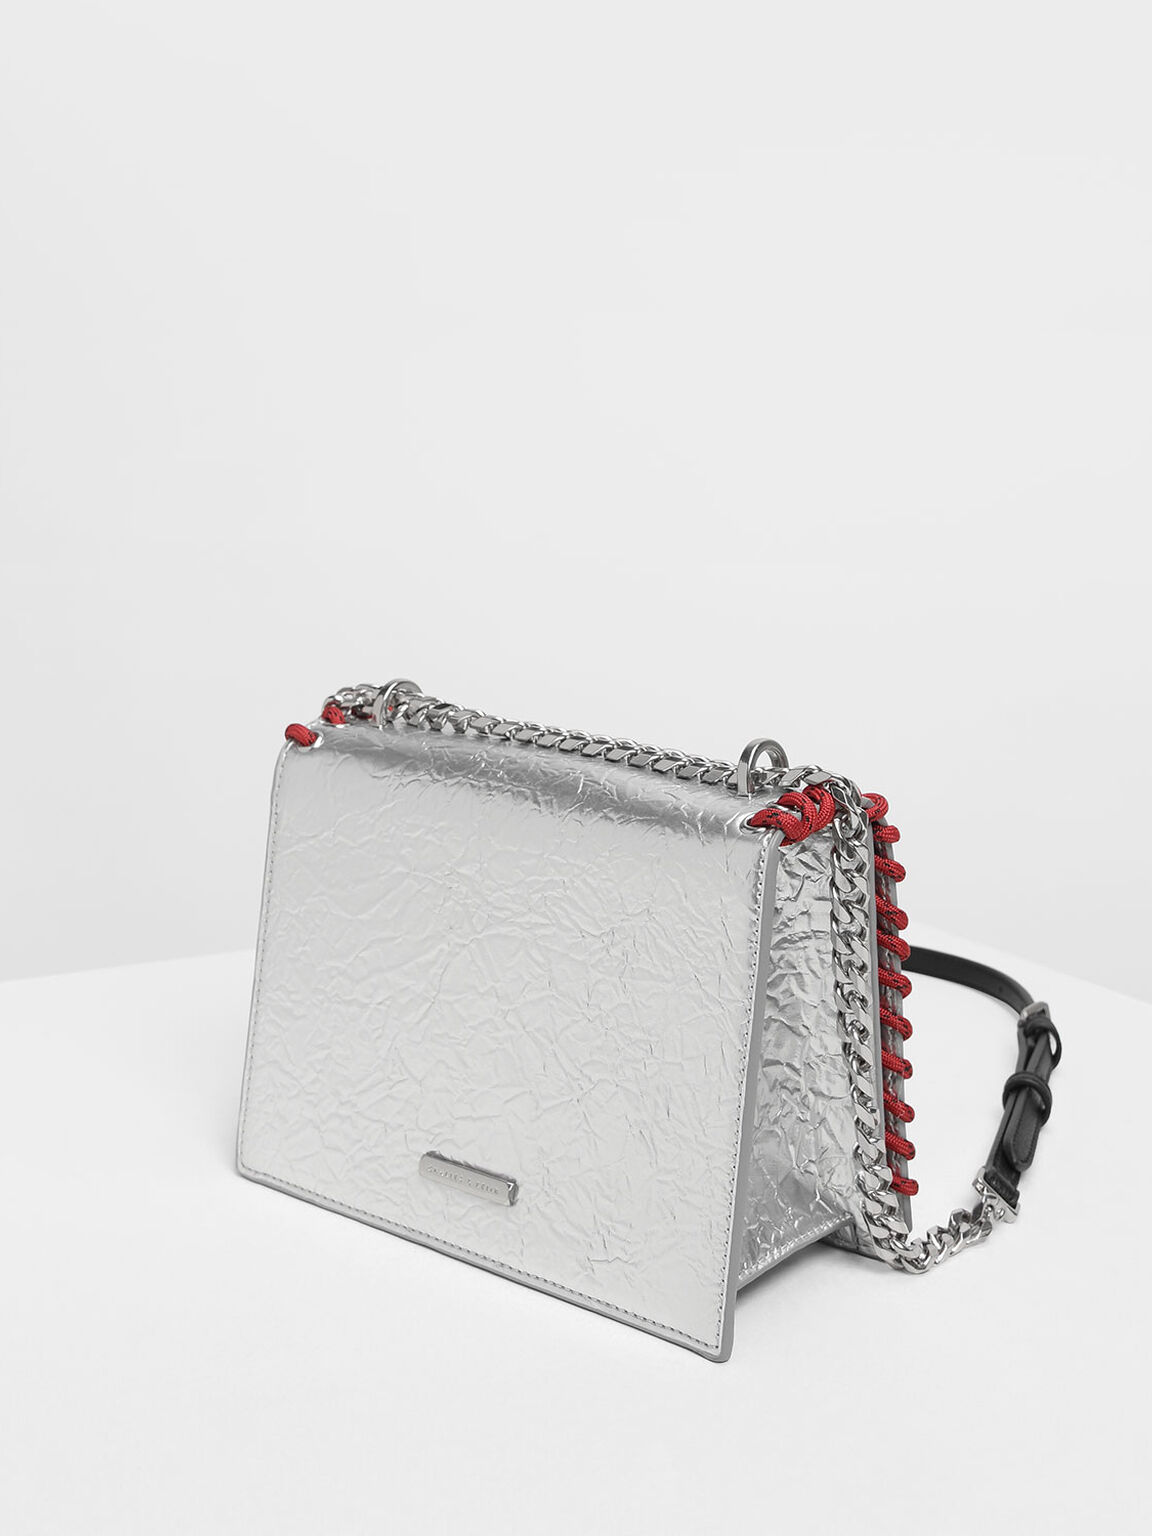 Grommet Accented Crossbody Bag, Silver, hi-res